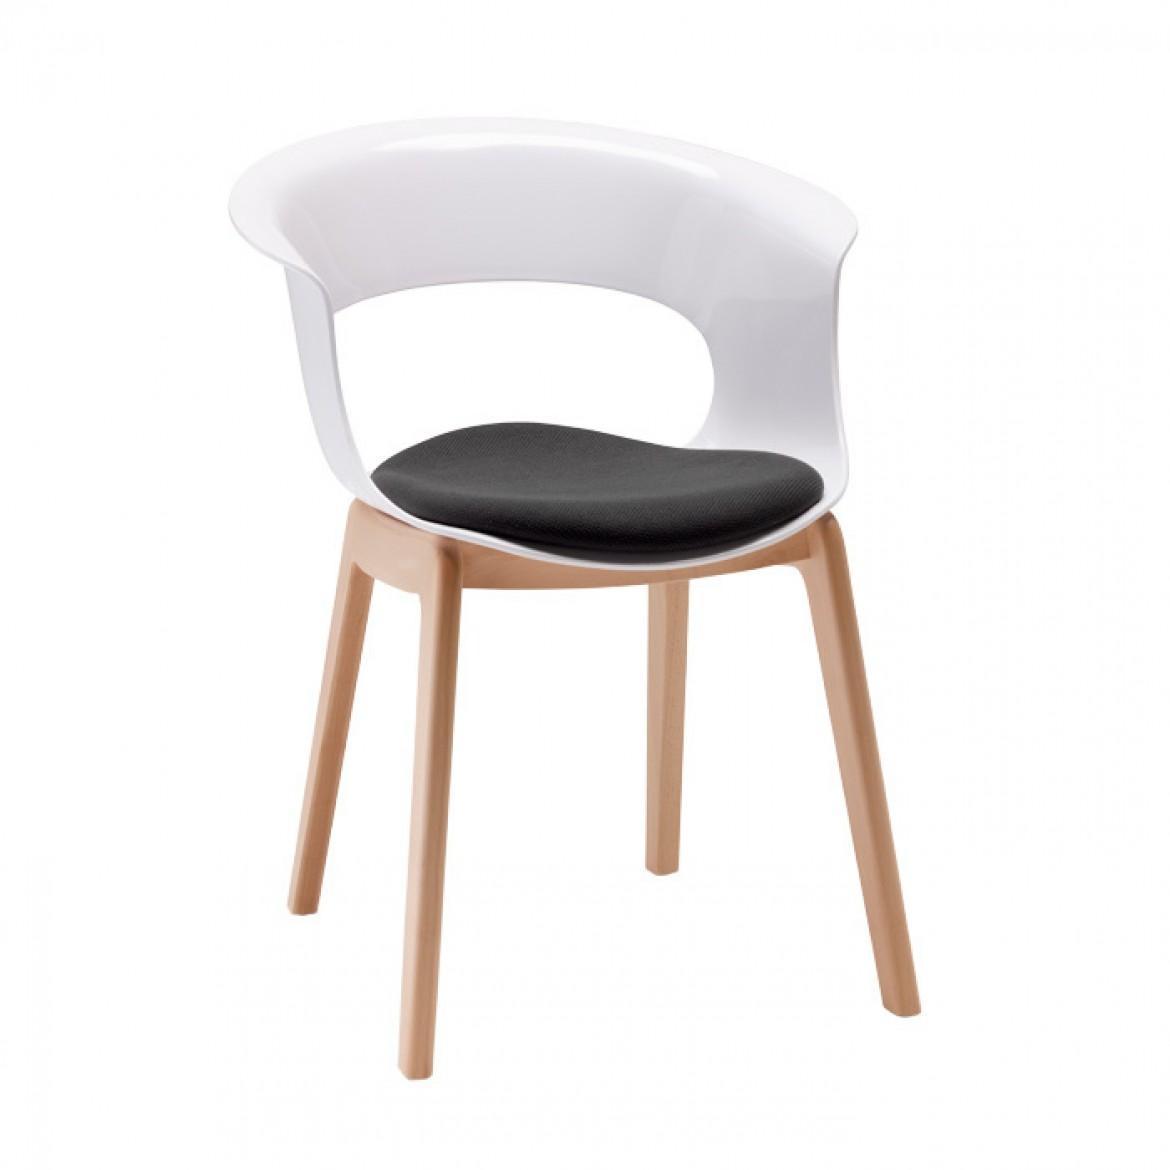 Кресло пластиковое с подушкой Natural Miss B Antishock with cushion